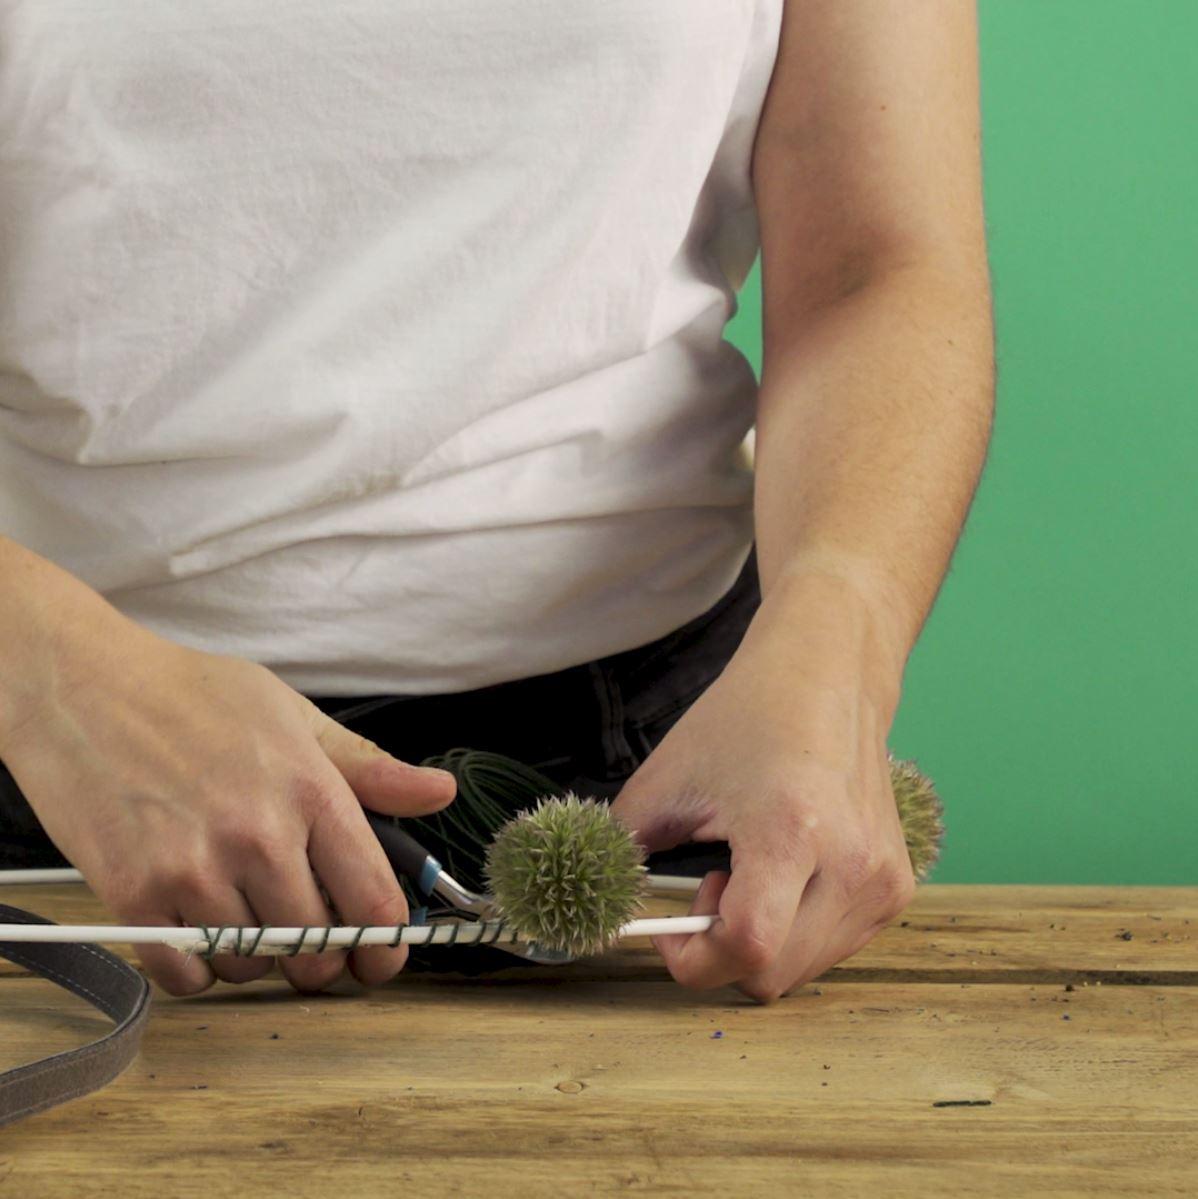 DIY Hortensiakrans stap 3: Distels bevestigen